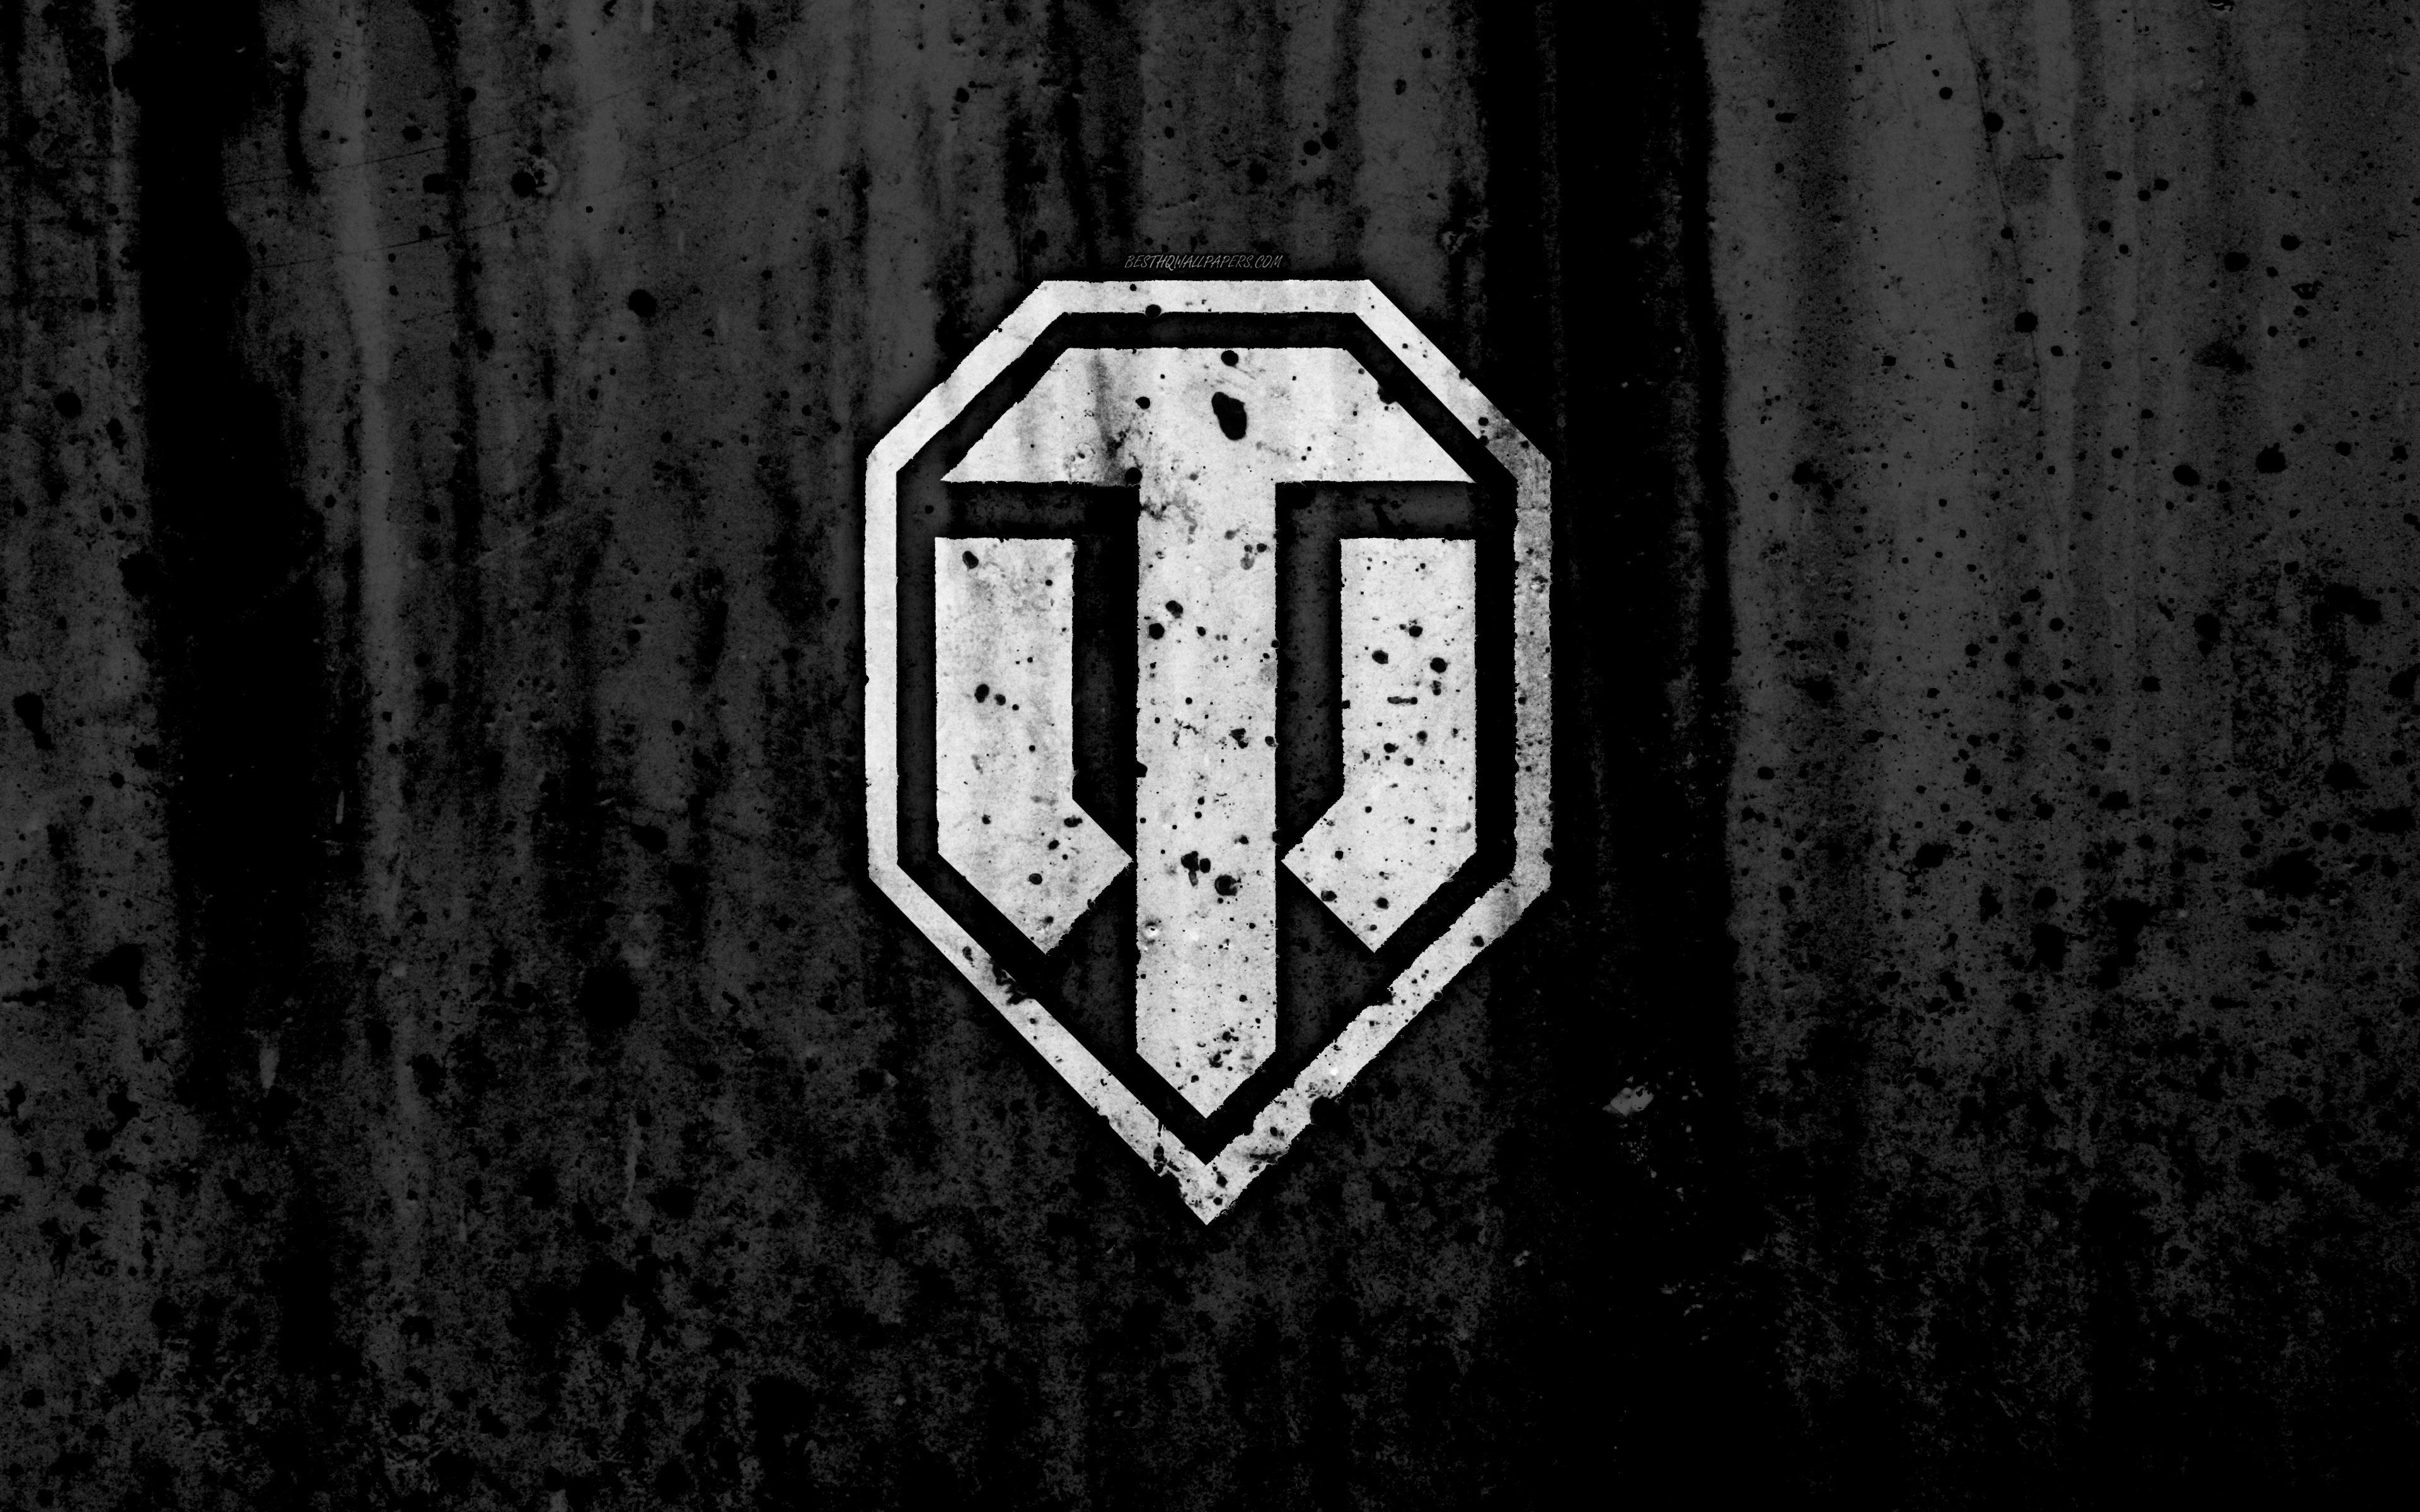 World Of Tanks Logo Wallpapers - Wallpaper Cave